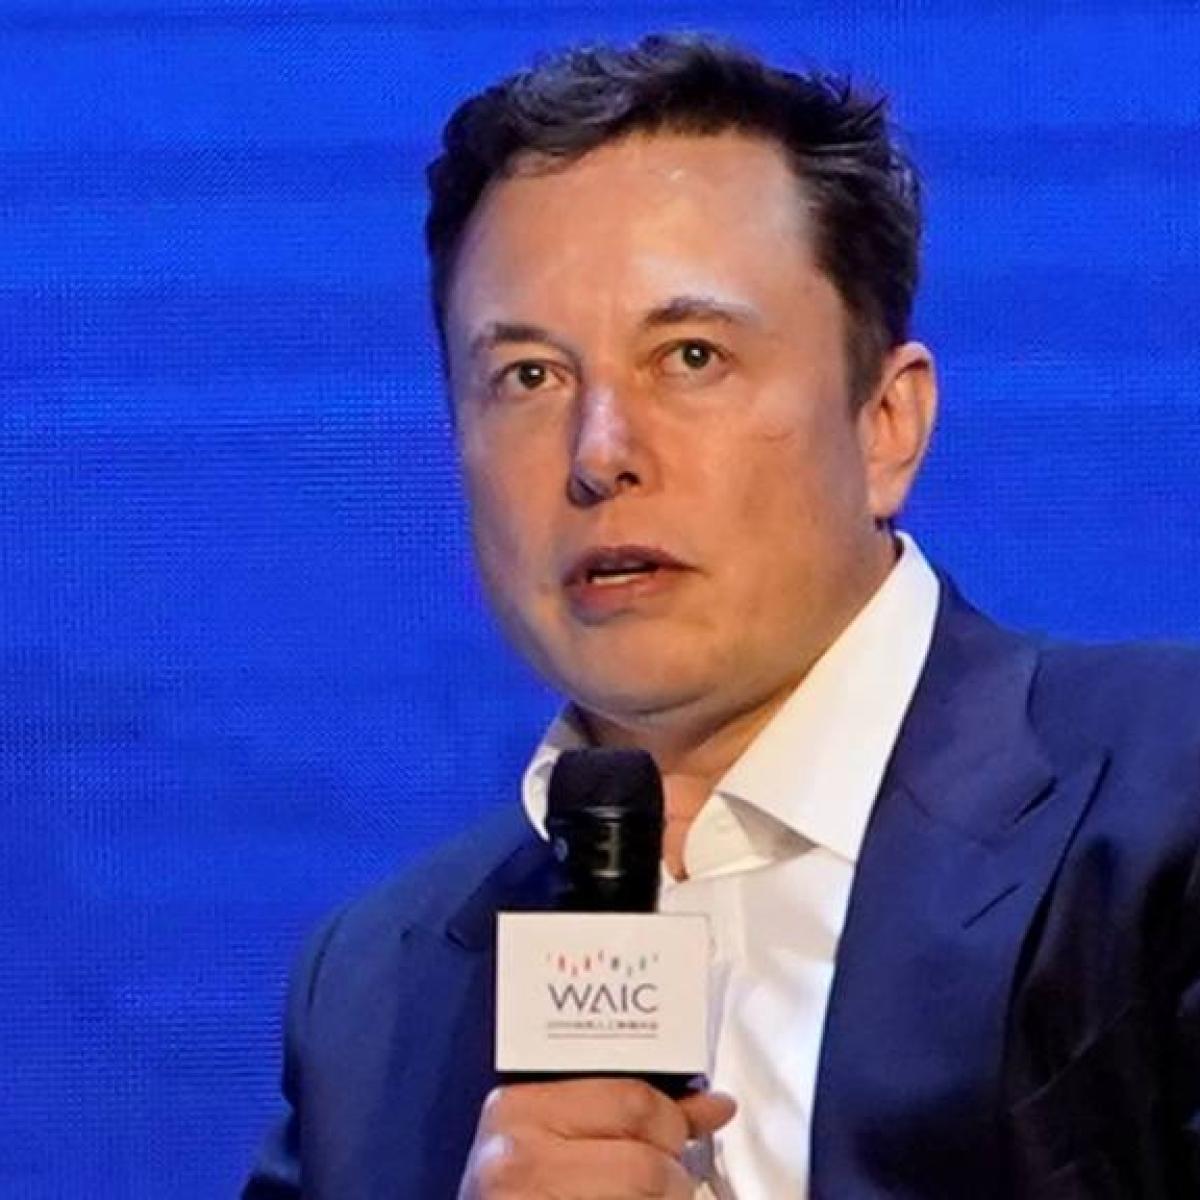 Elon Musk announces reopening of Tesla's California plant, dares authorities to arrest him